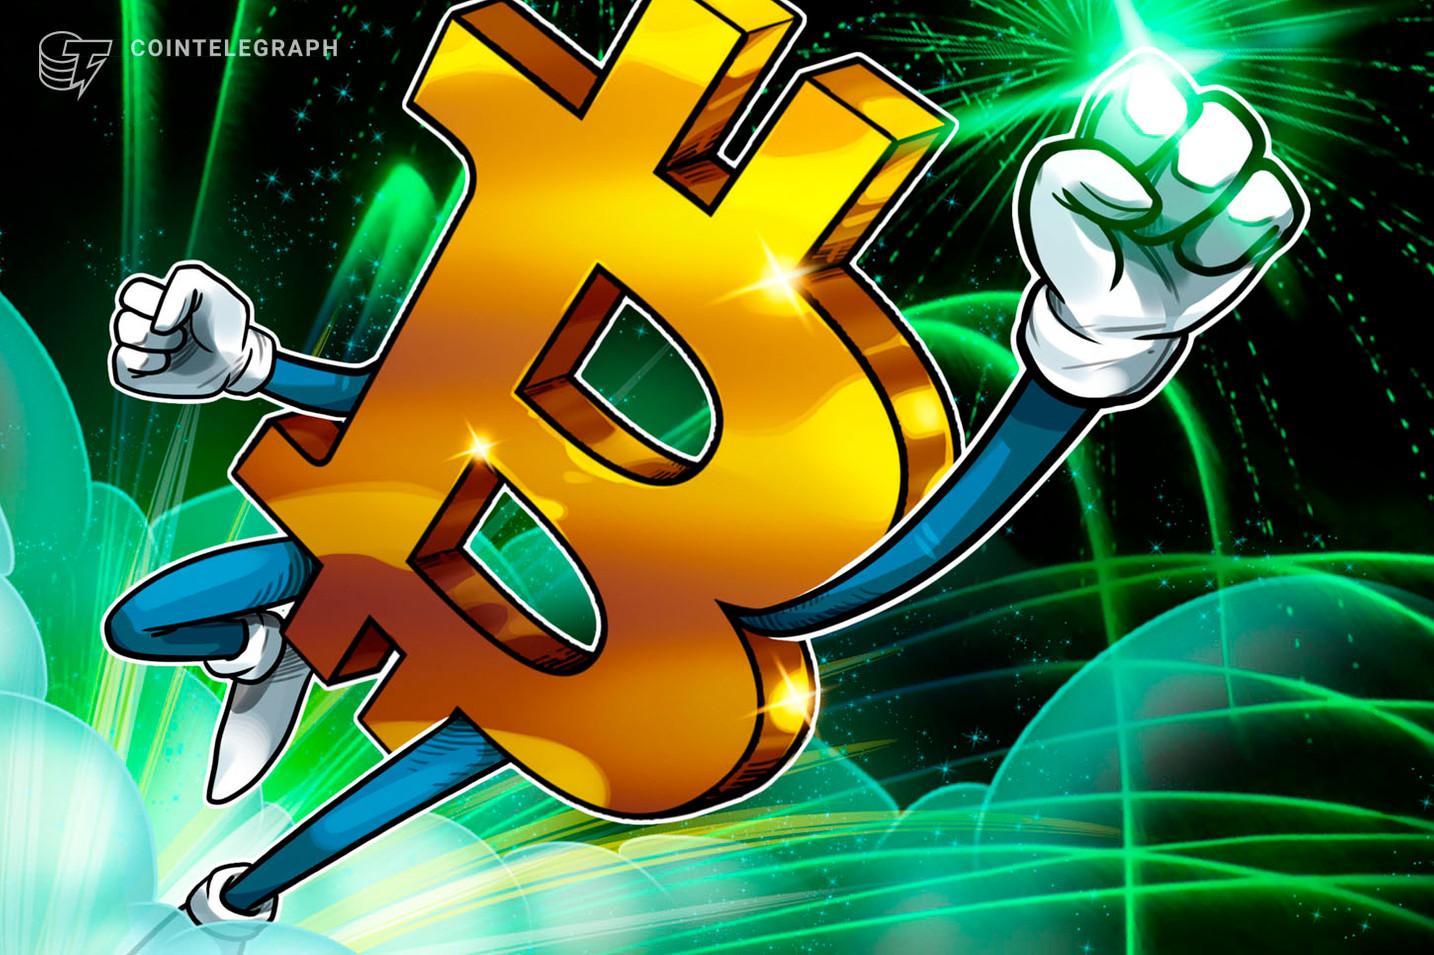 Bitcoin futures hit $20.3K - Cointelegraph